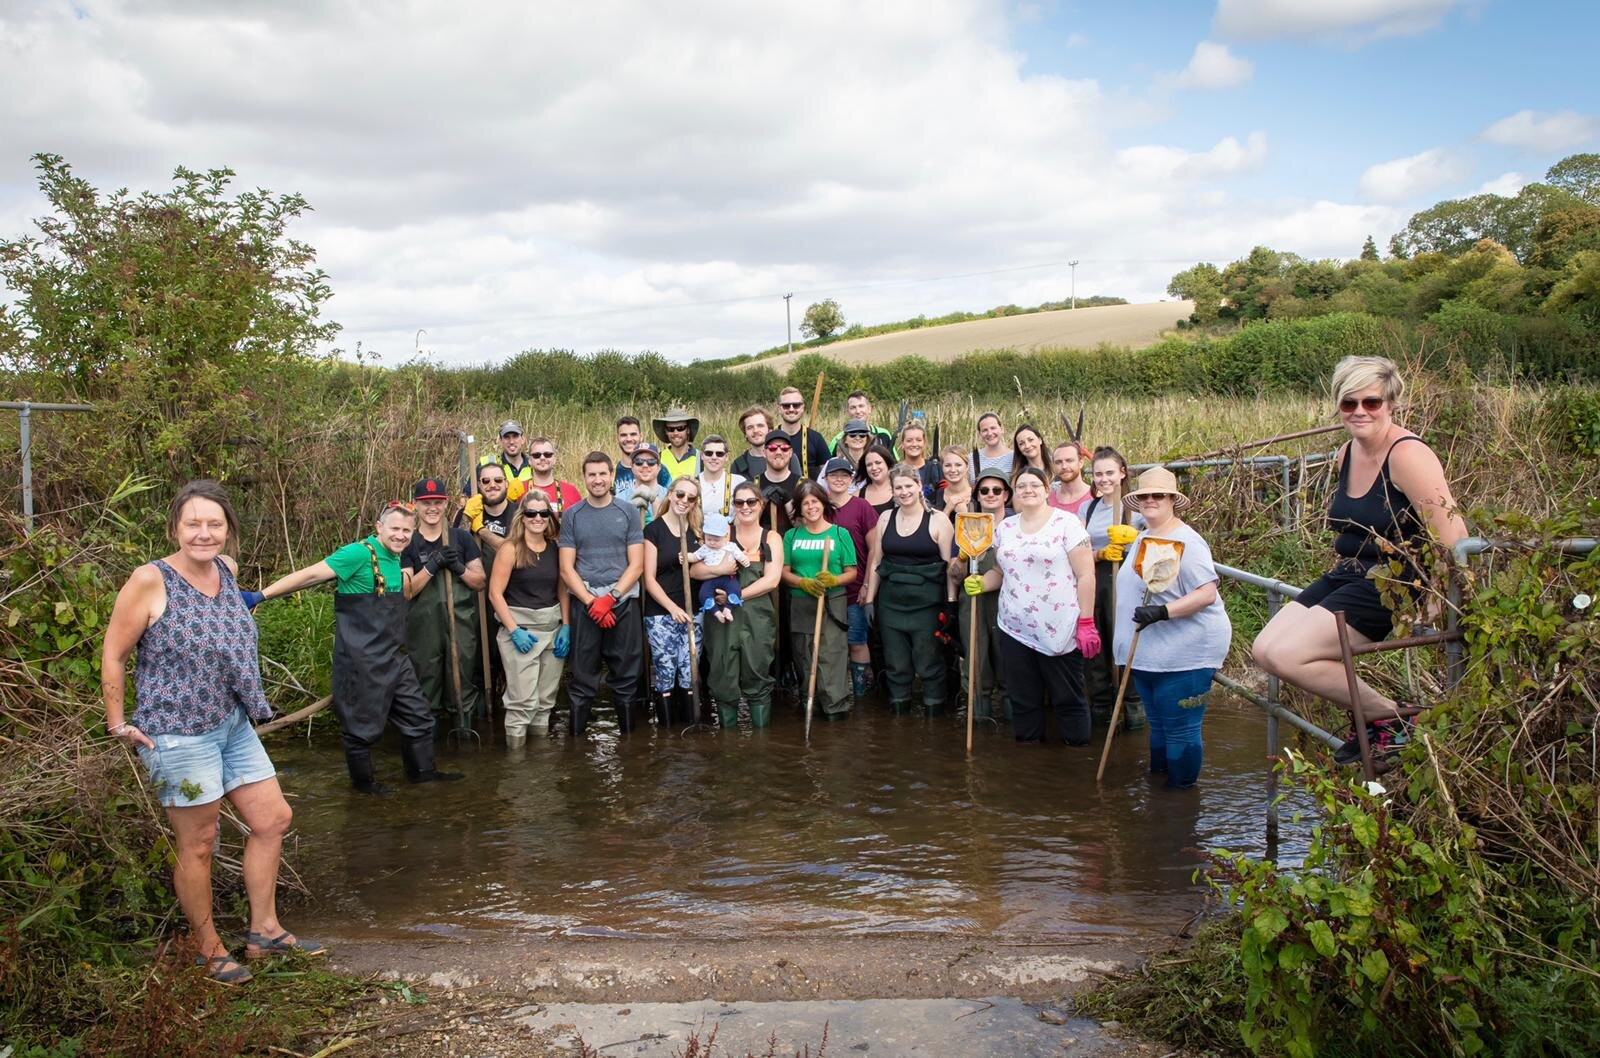 Dorset Wildlife Team Photo - August 2019.jpeg